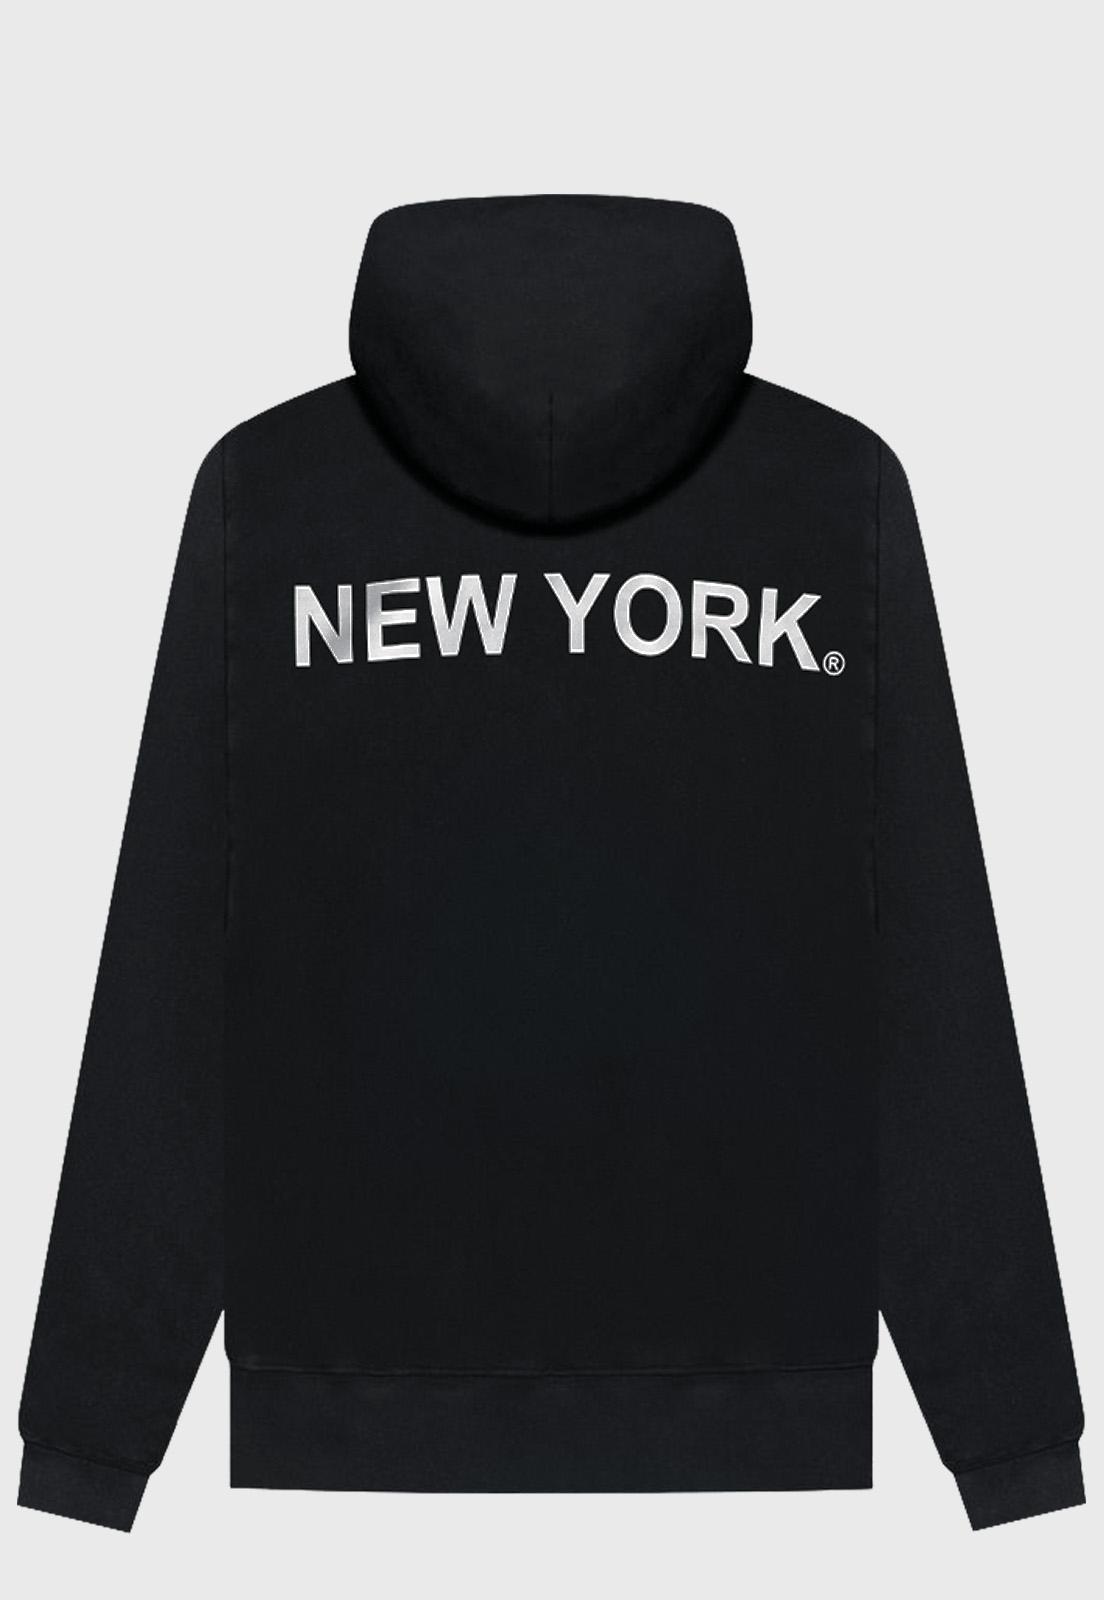 Blusa Moletom Black Prison New York